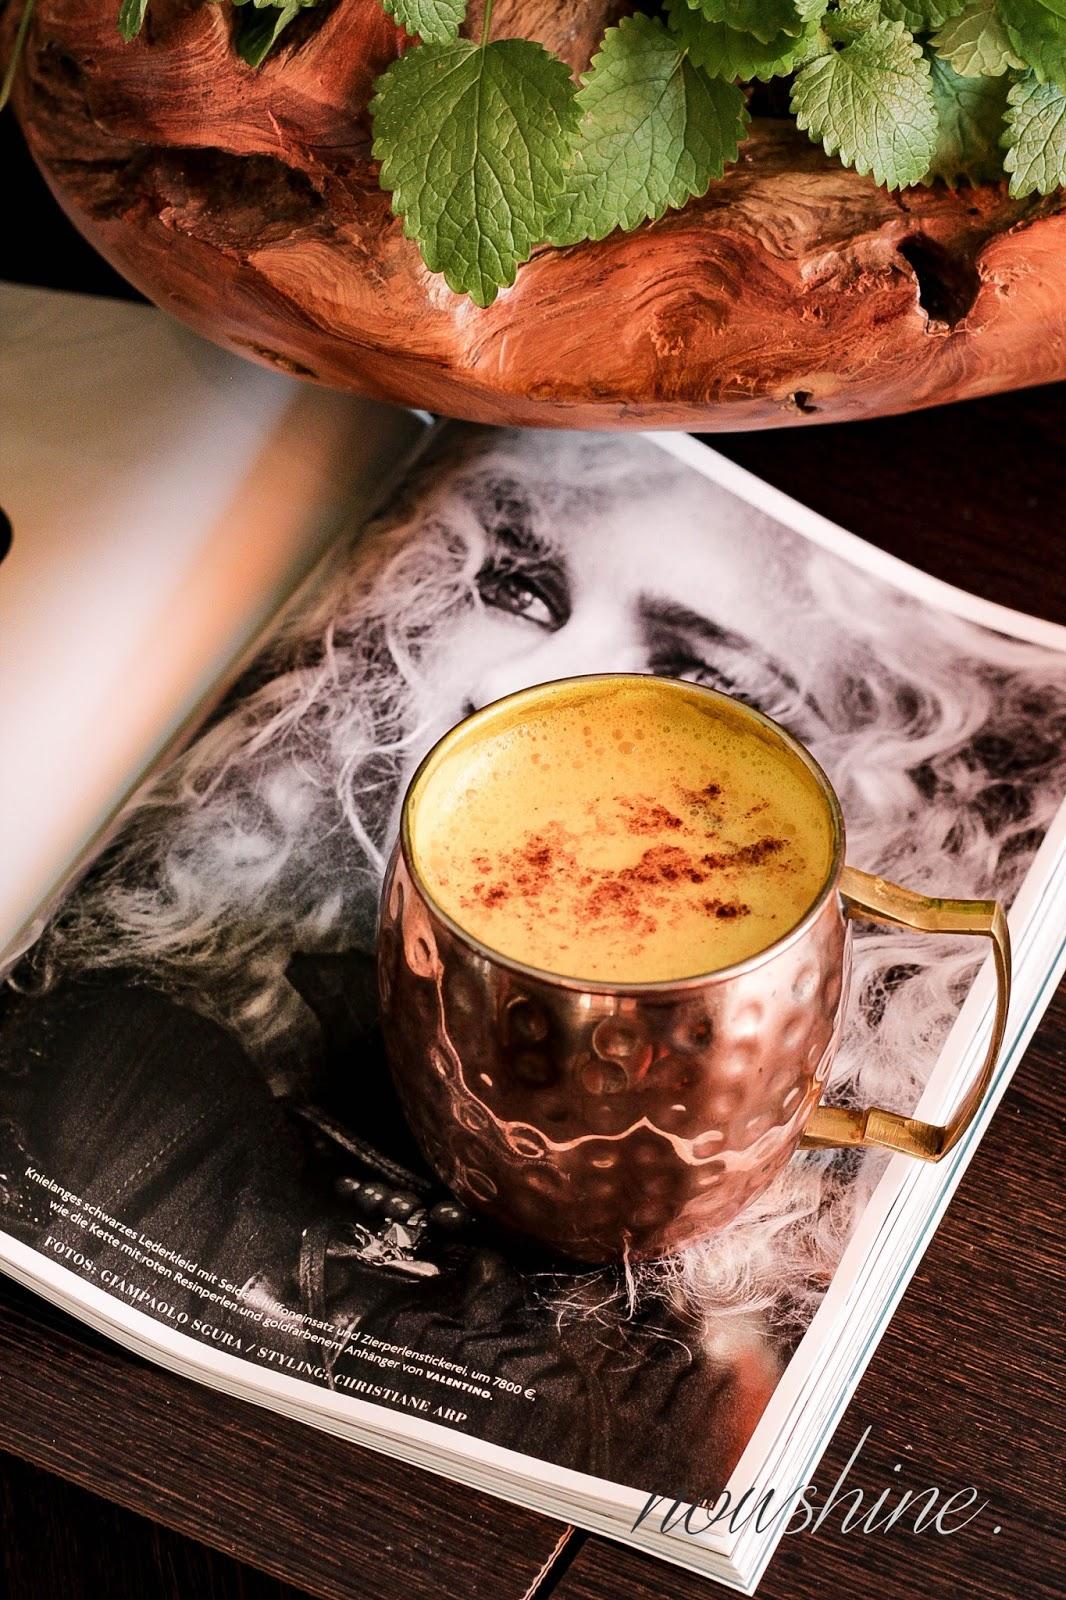 Nowshine Herbst Cozy Lifestyle über 40